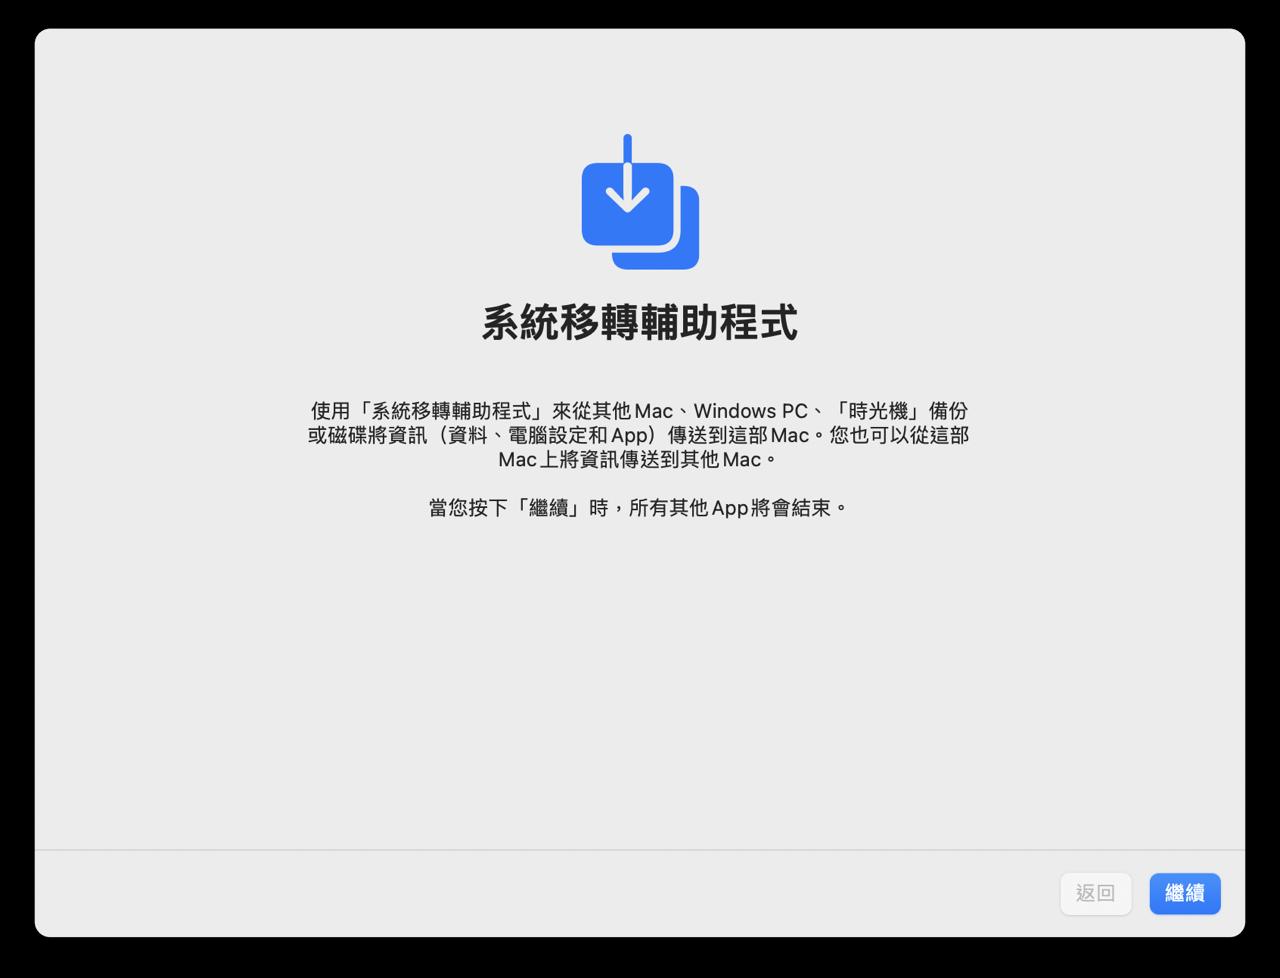 Mac 系統移轉輔助程式